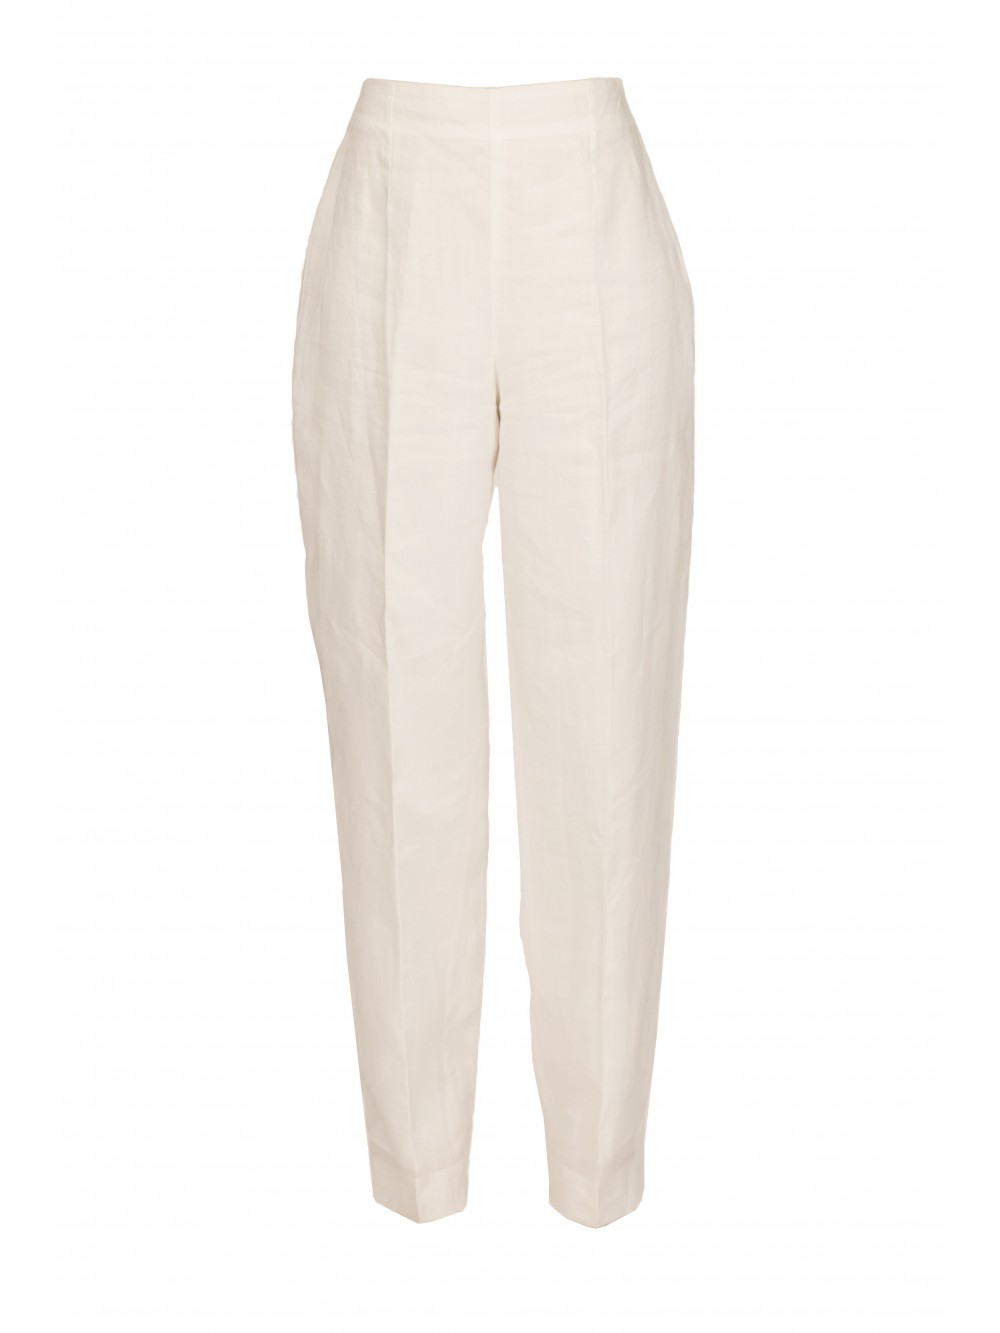 Wide leg linen Pant | Hollie